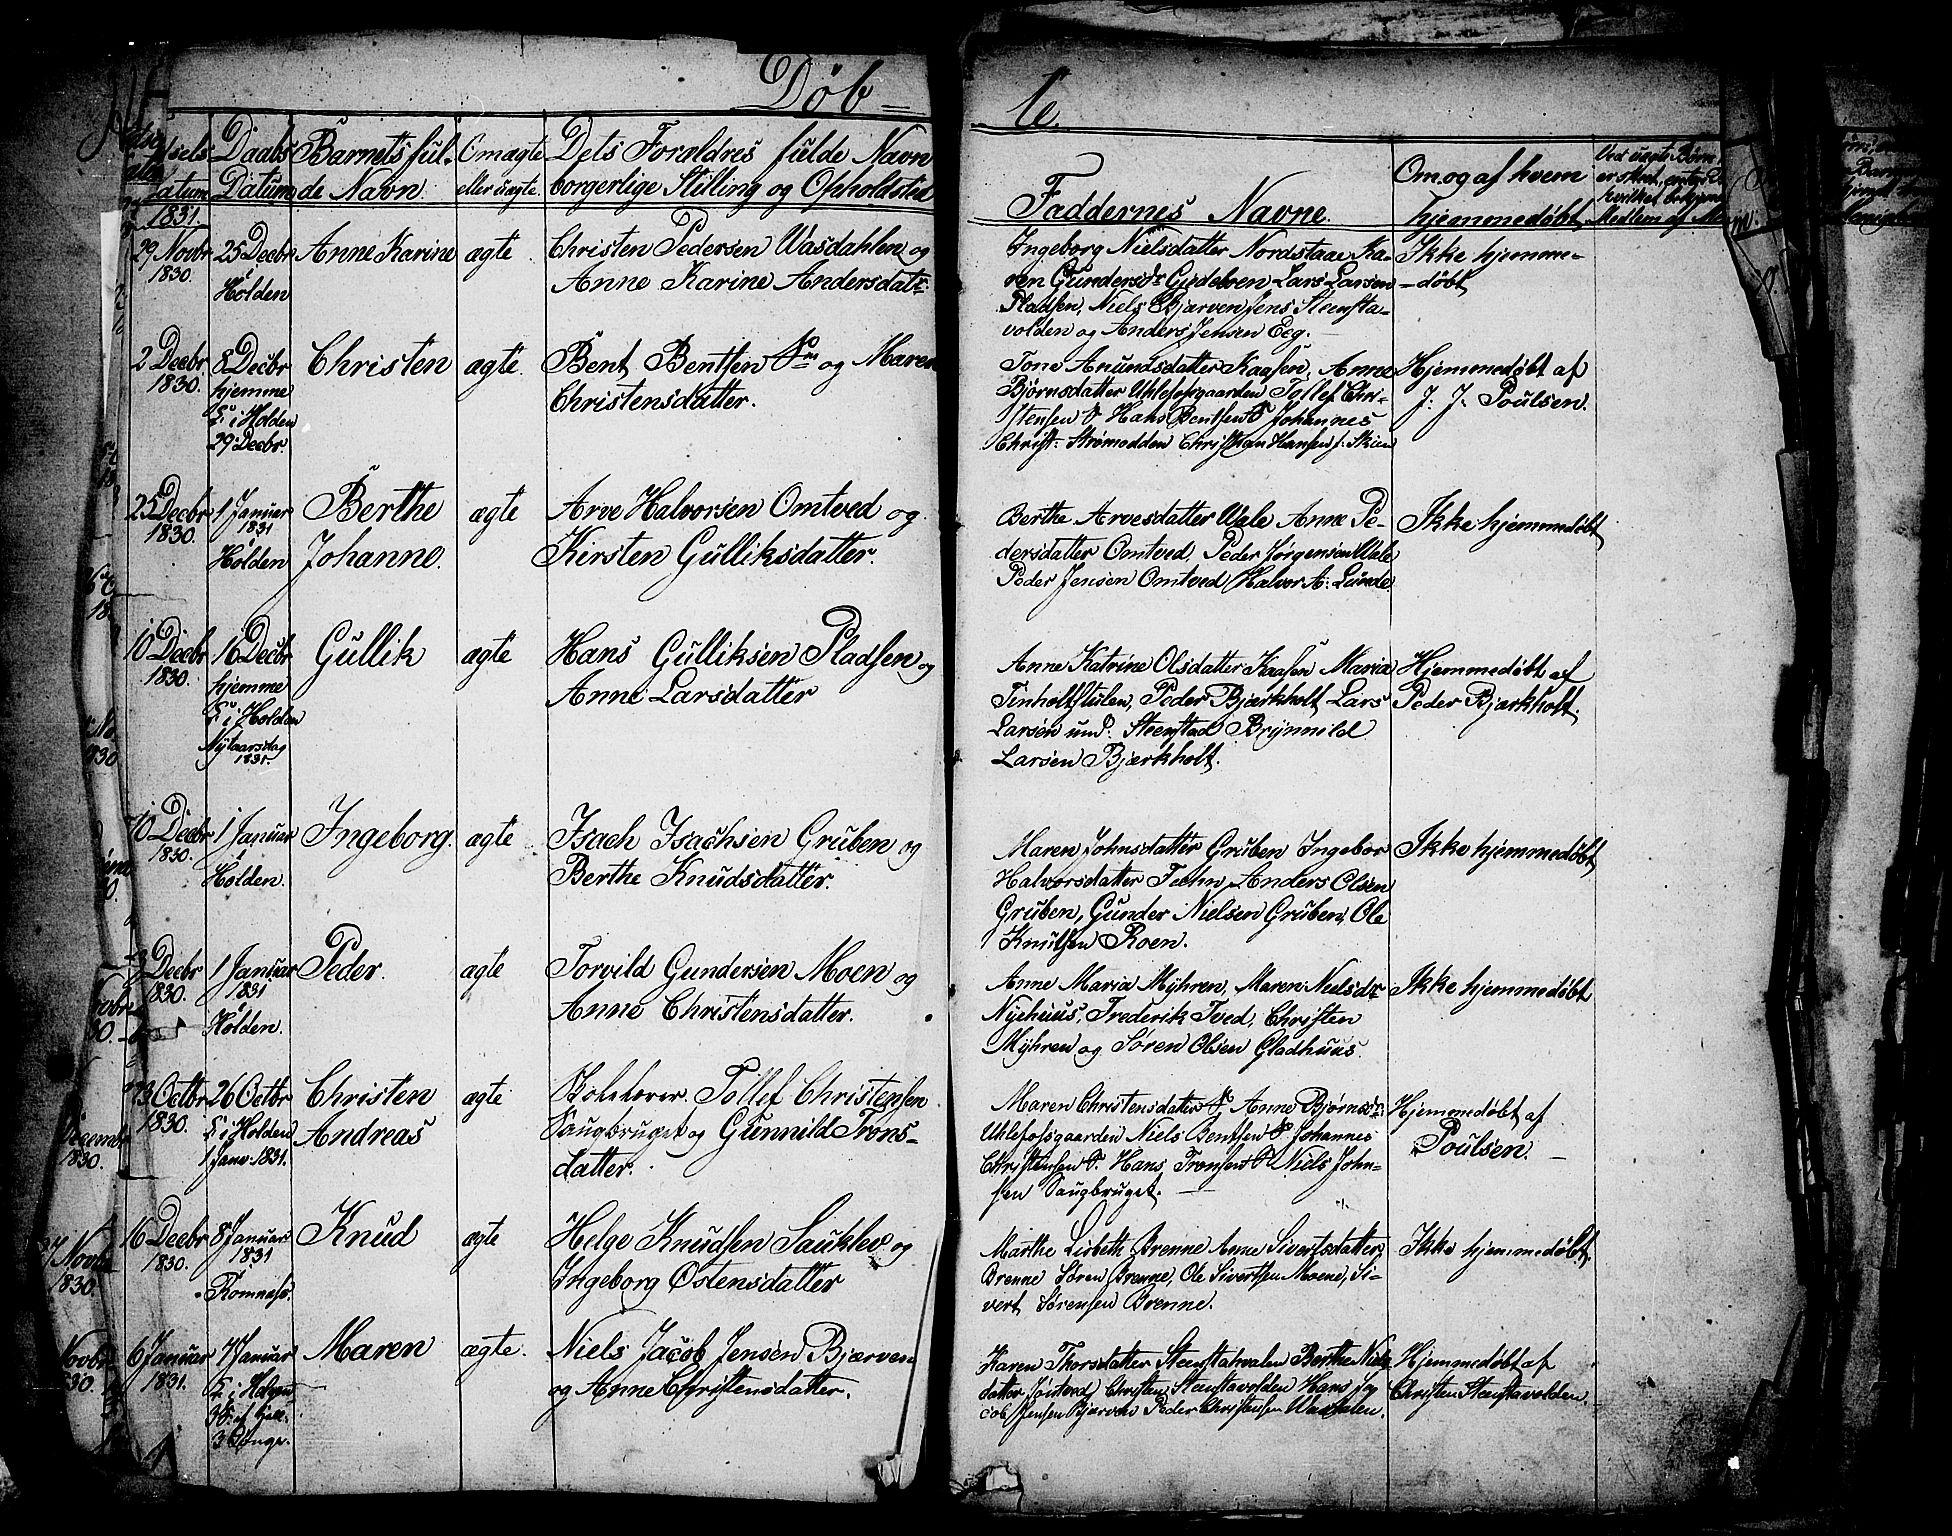 SAKO, Holla kirkebøker, F/Fa/L0004: Ministerialbok nr. 4, 1830-1848